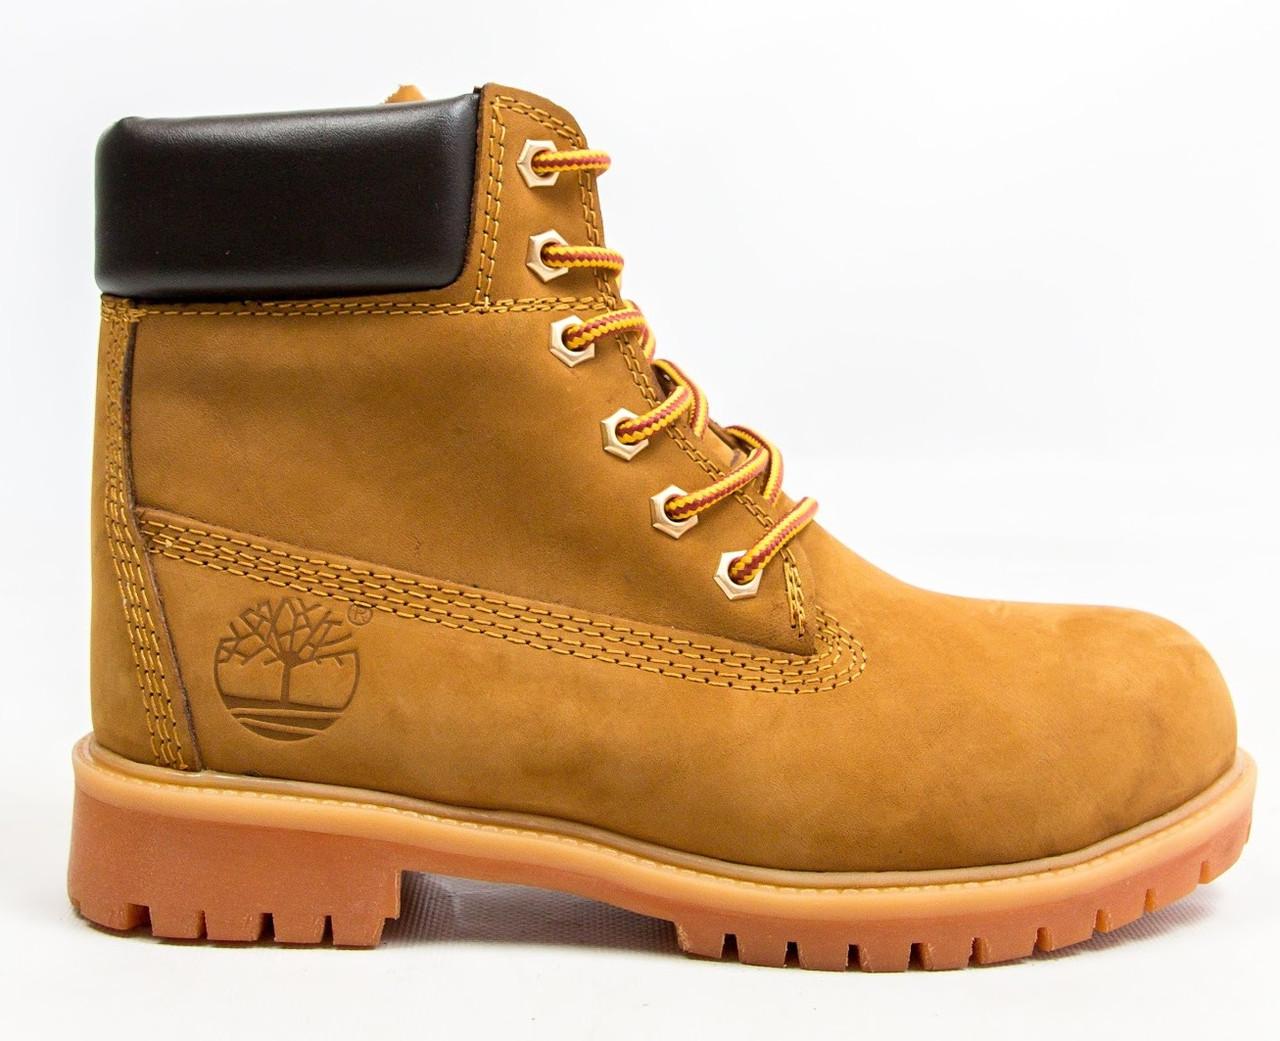 Зимние мужские ботинки Timberland classic 6 inch yellow без меха (Реплика ААА+)